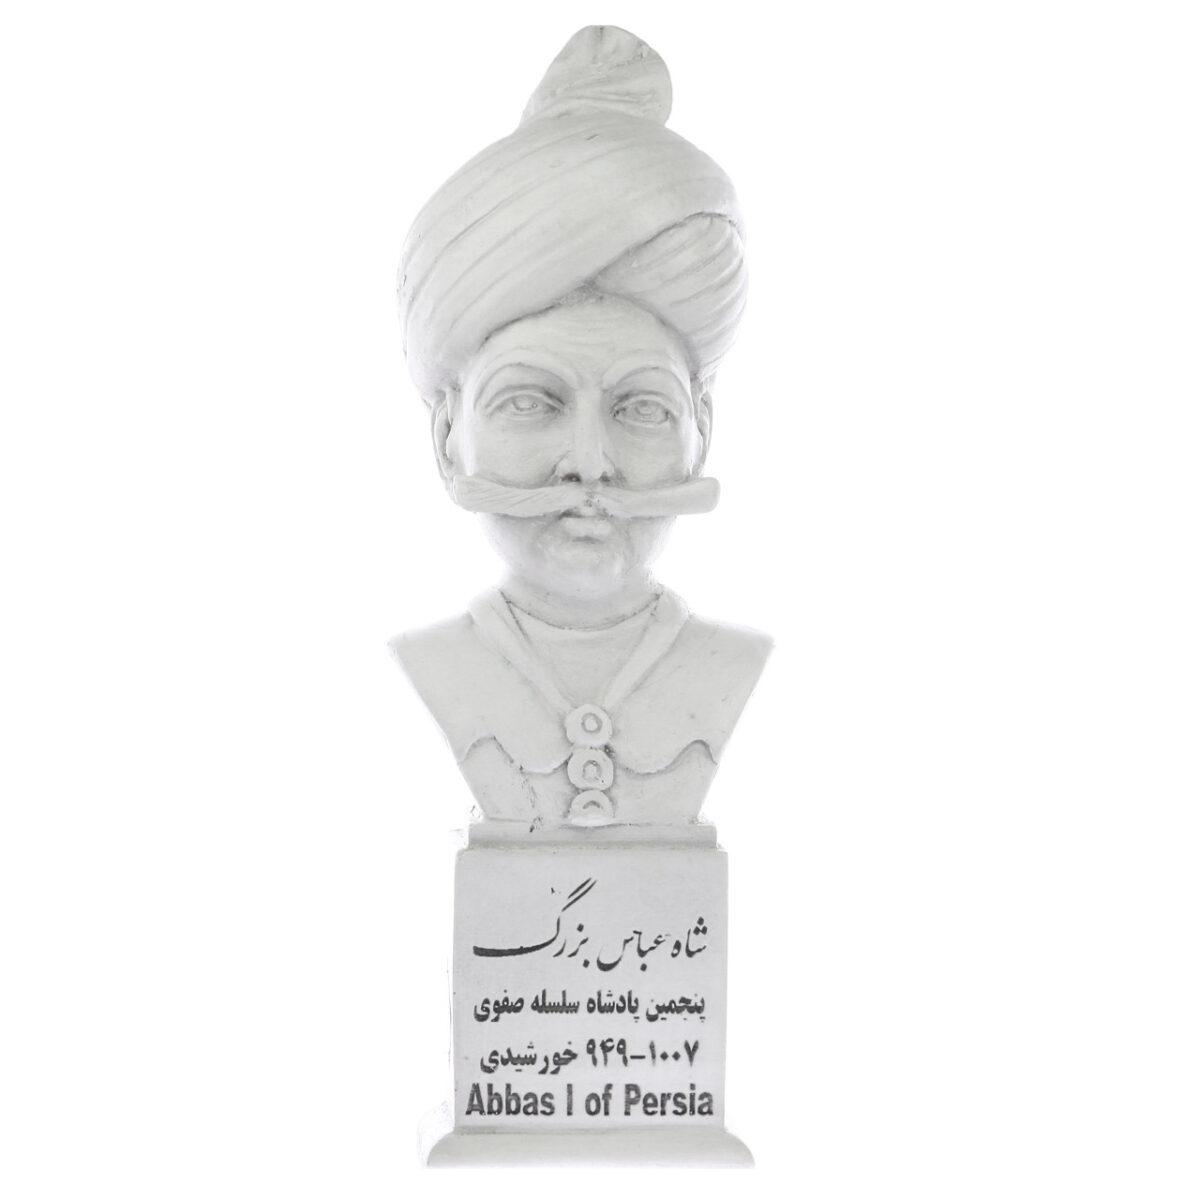 shah abbas s 1200x1200 - سردیس شاه عباس یکم